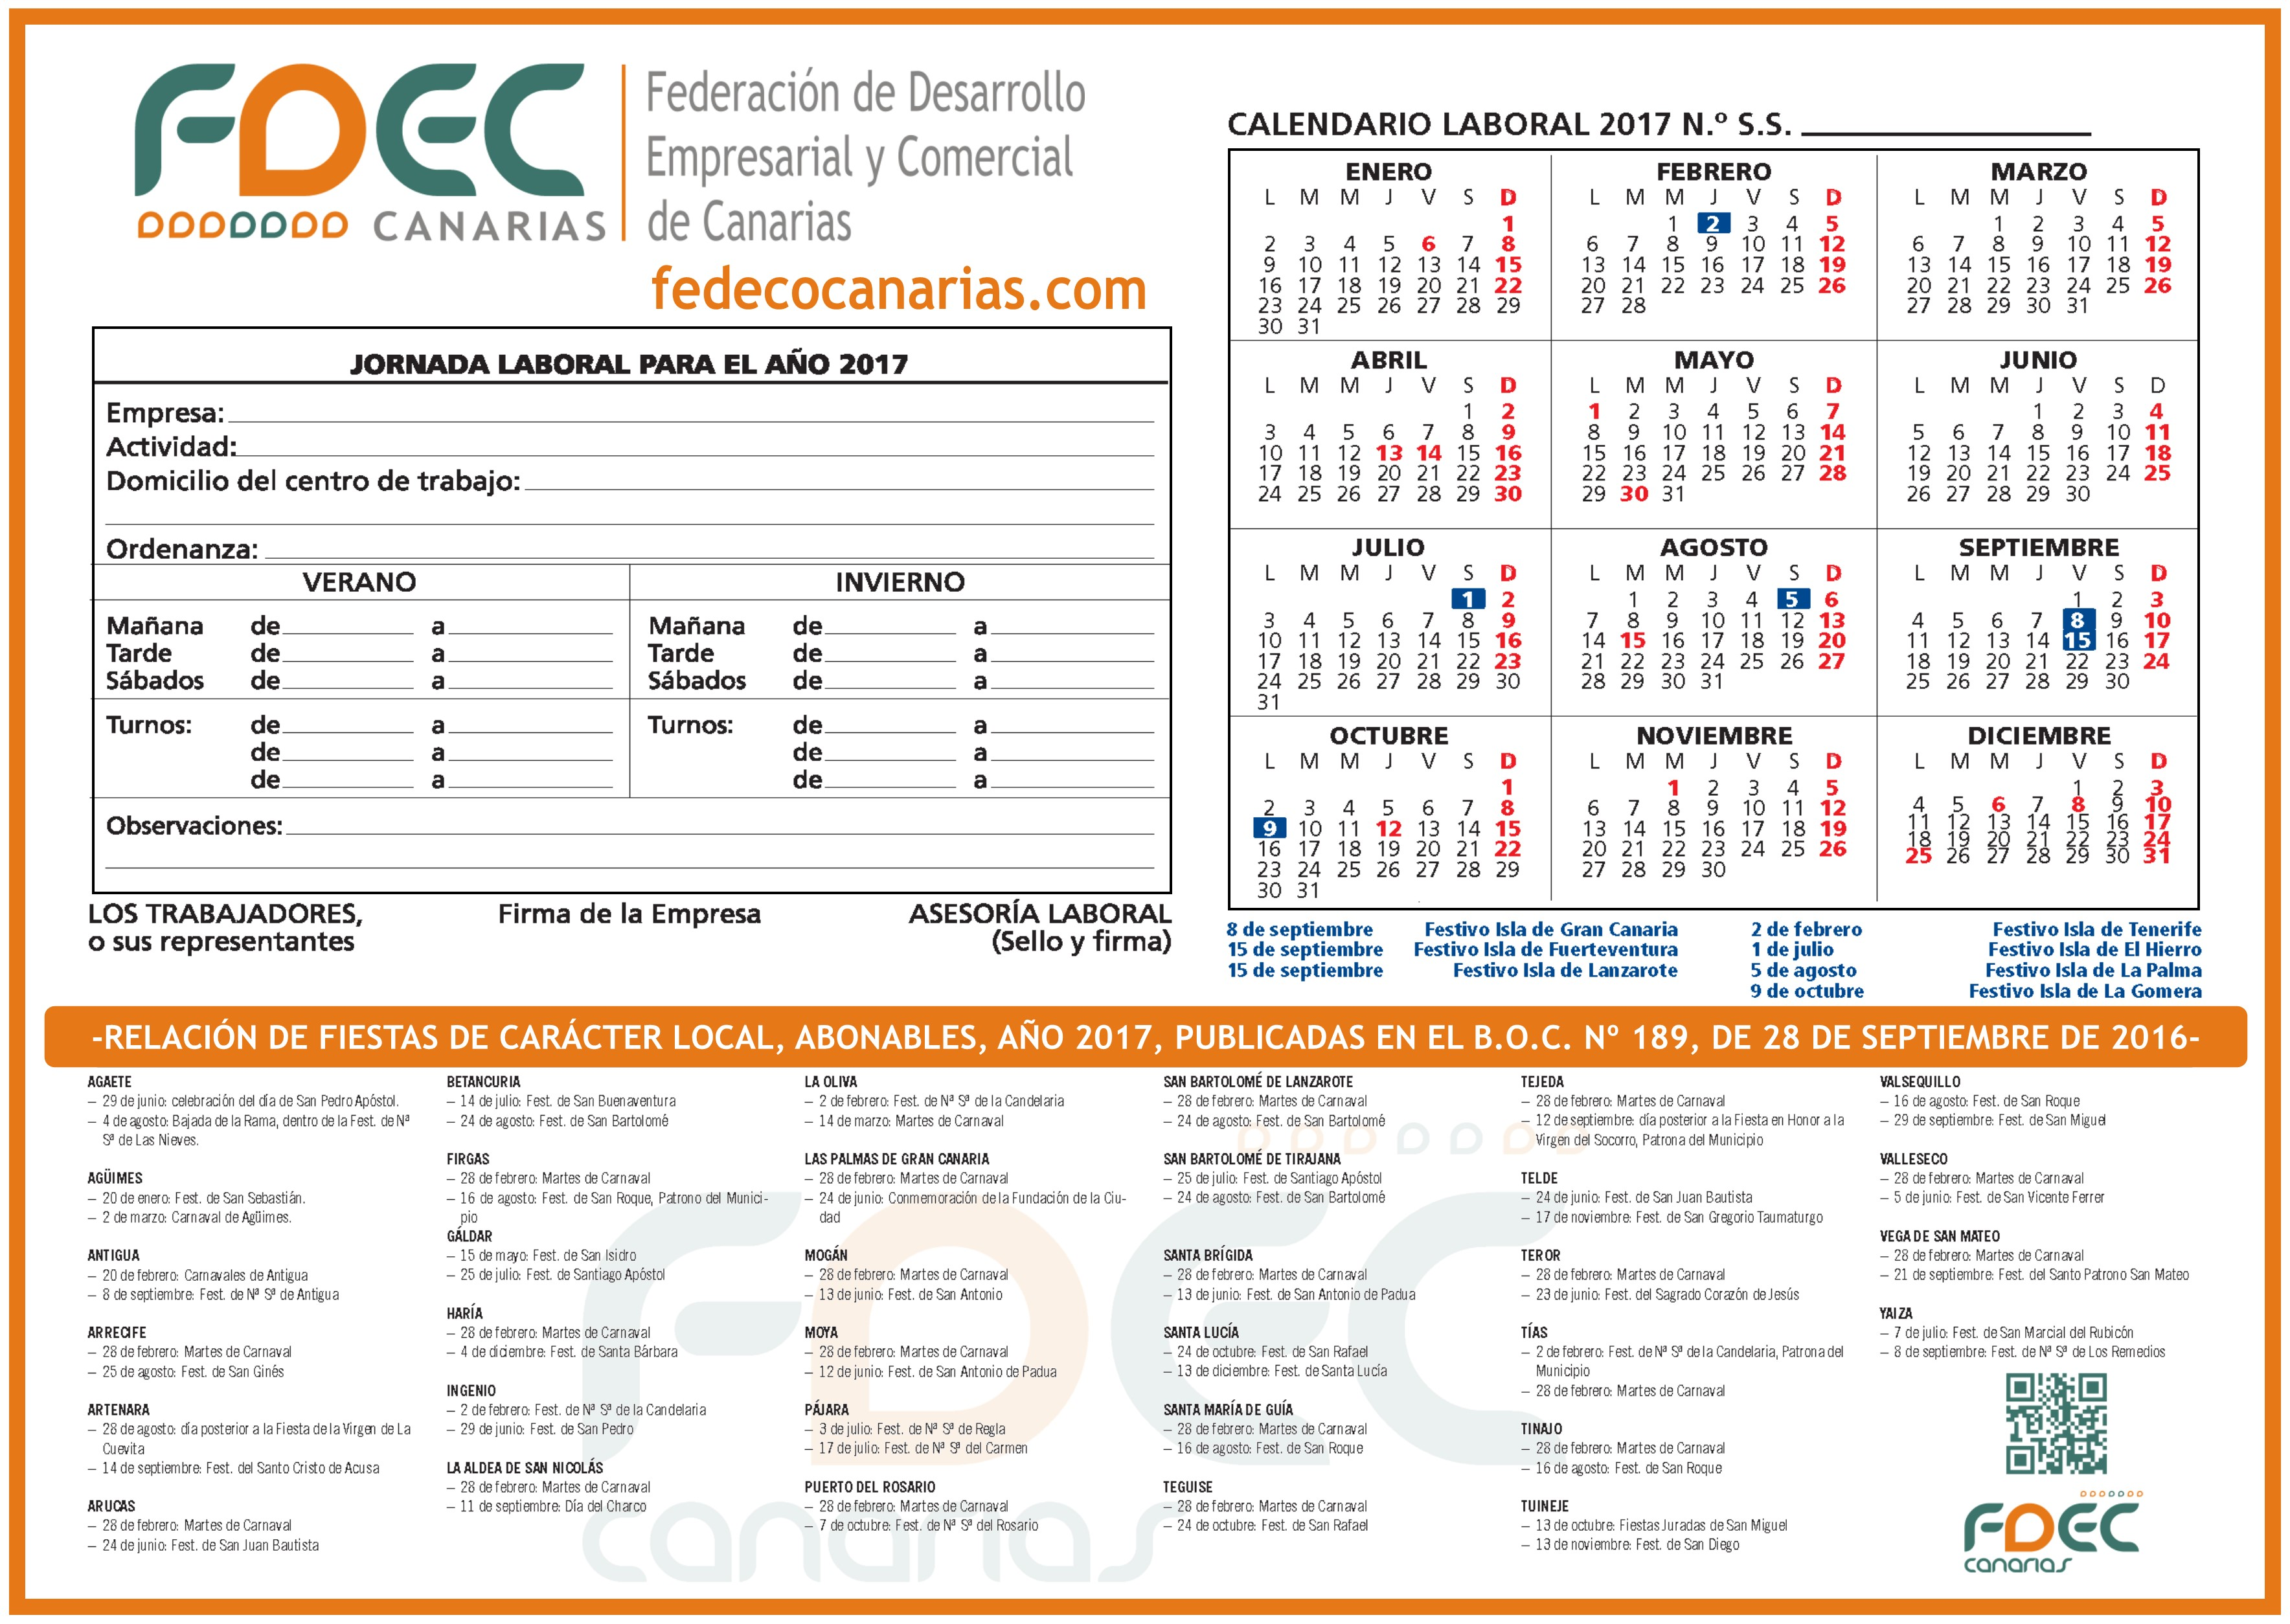 calendario-laboral-fdec-gran-canaria-2017